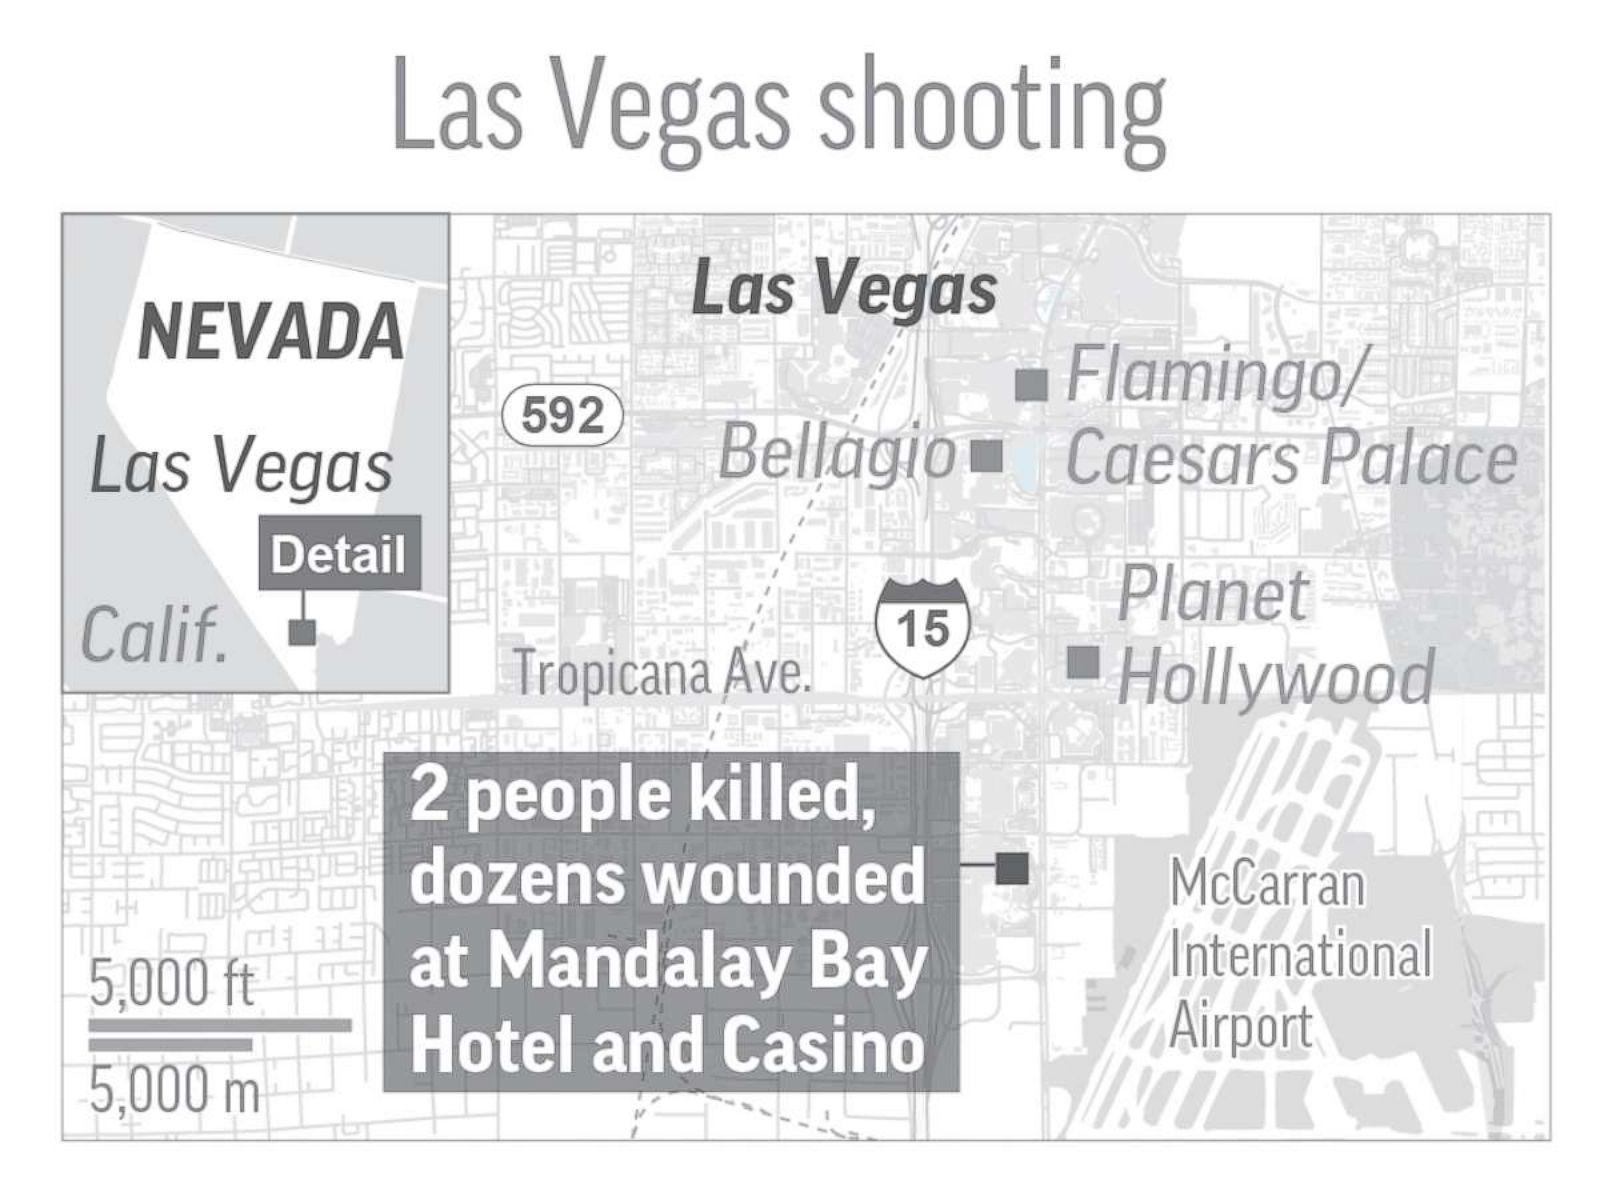 Photo Map Shows Location Of A Shooting At Mandalay Bay Hotel And